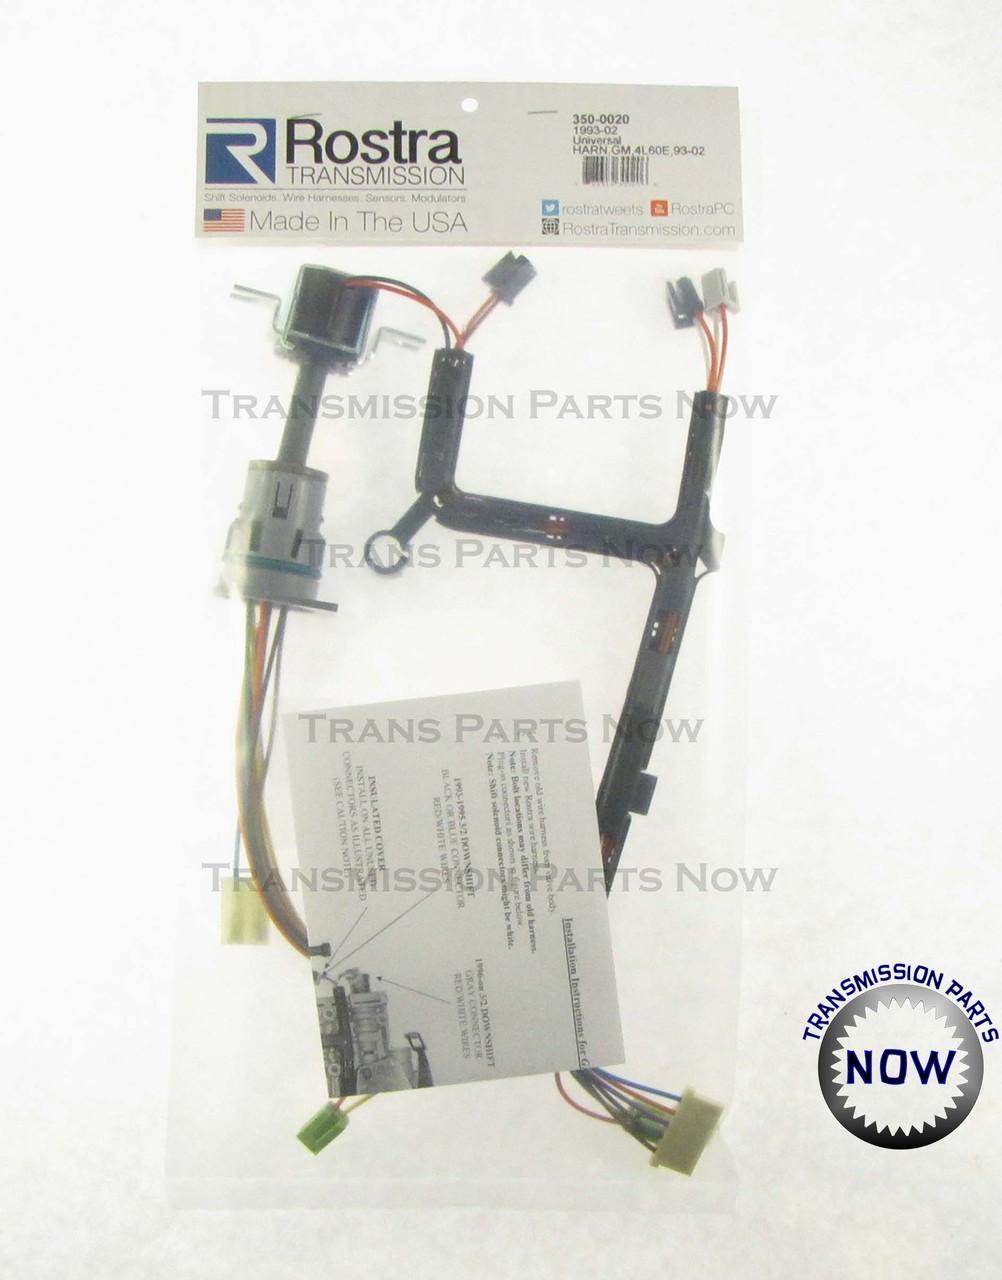 Rostra 350-0020, 51870EC, 12121299, 74425NC, 4L60E internal wire harness, Wire harness, 4l60E transmission parts, 4l60E wire harness, 4l60E TCC solenoid